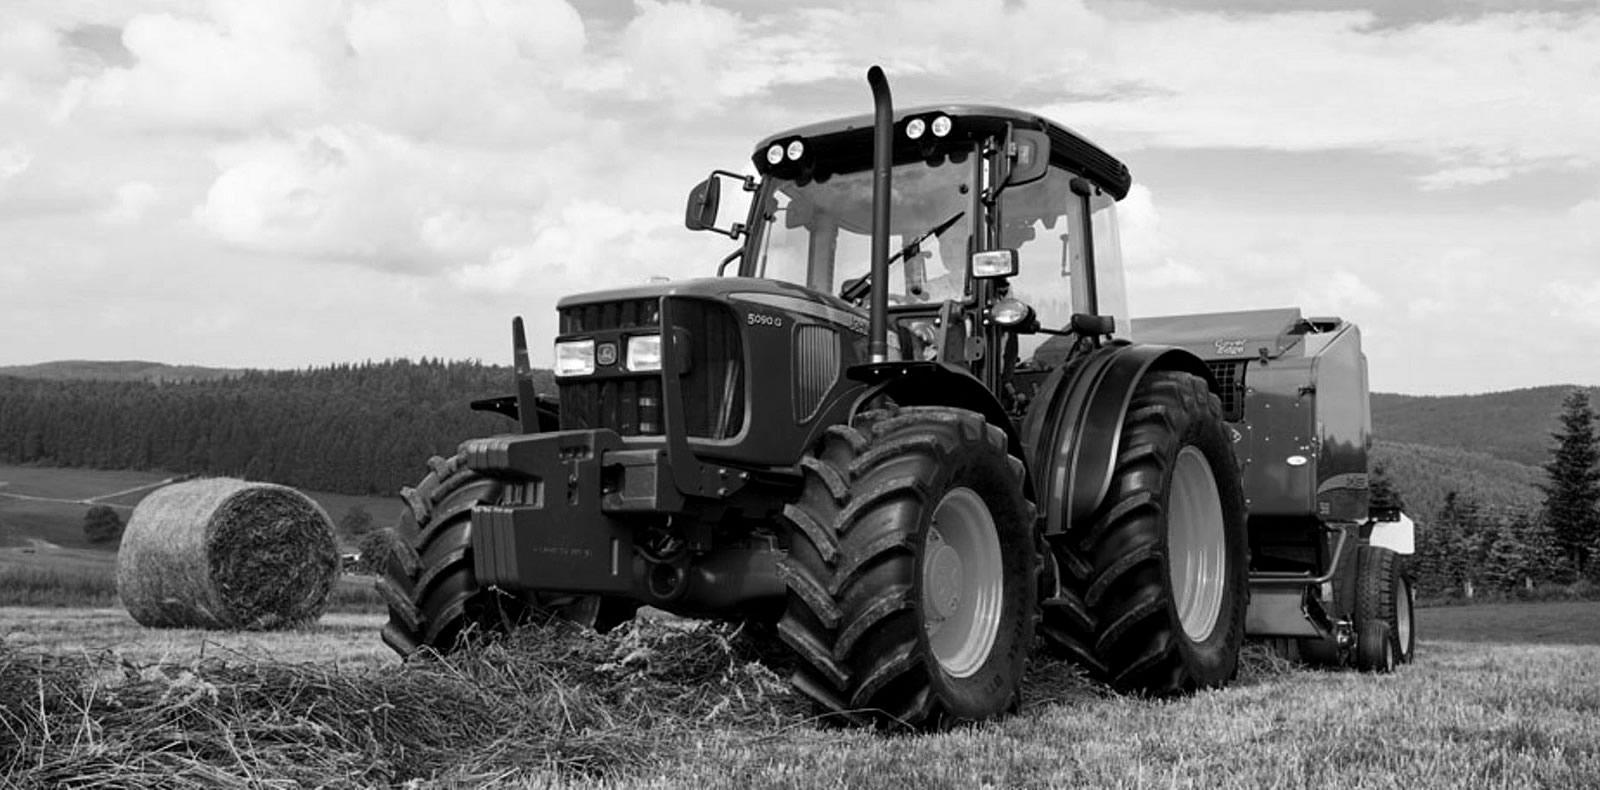 Homologación vehículos agrícolas